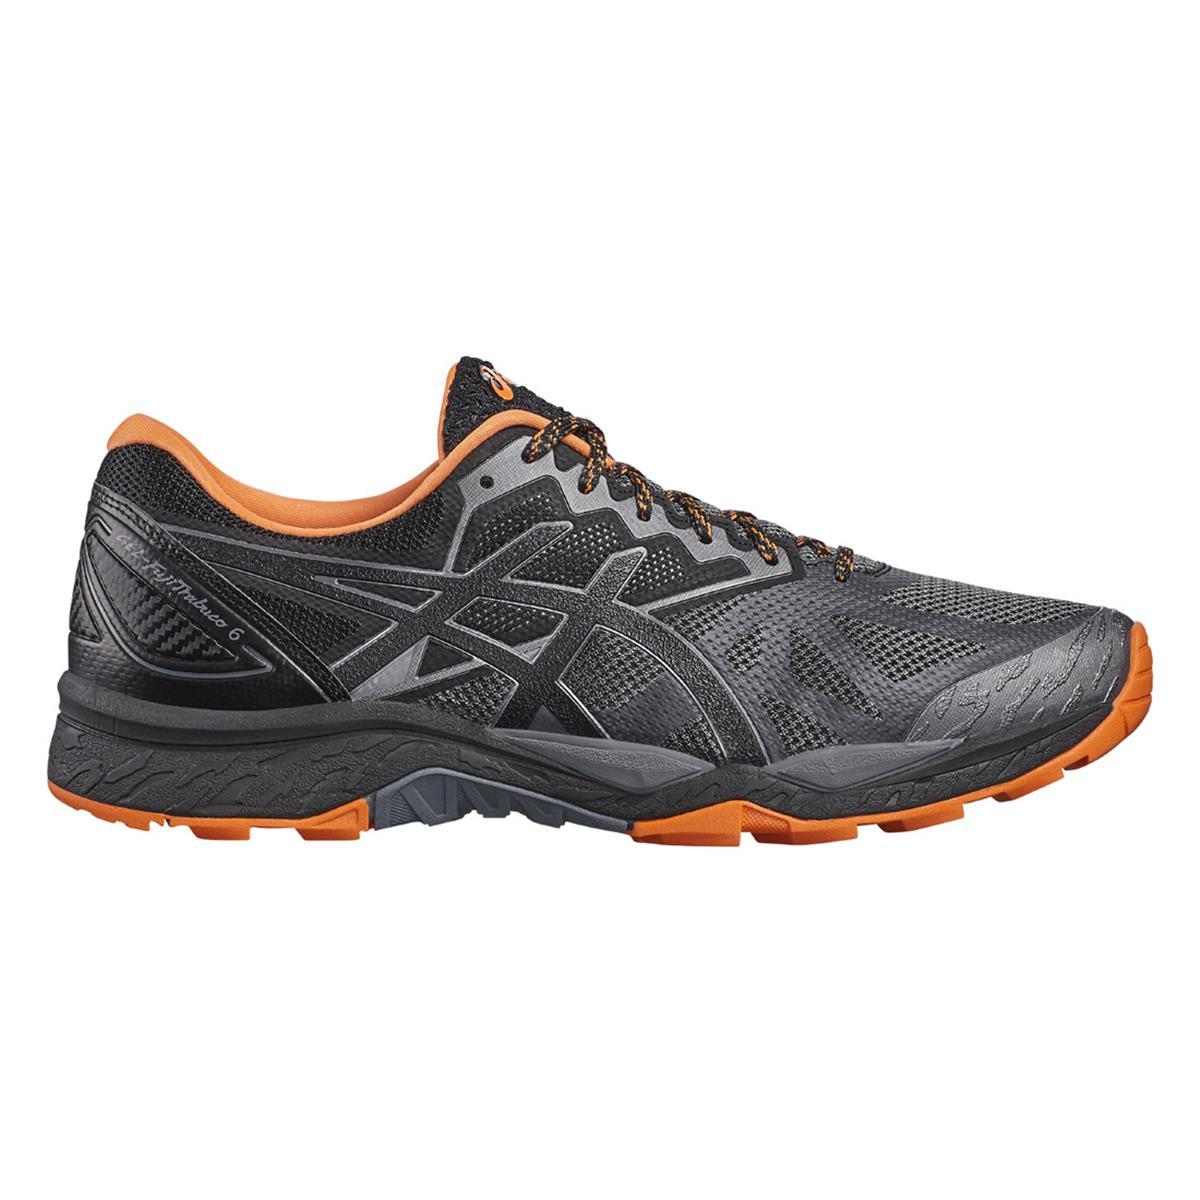 Asics Gel Fuji Trabuco 6 Mens Trail Running Shoes (Carbon